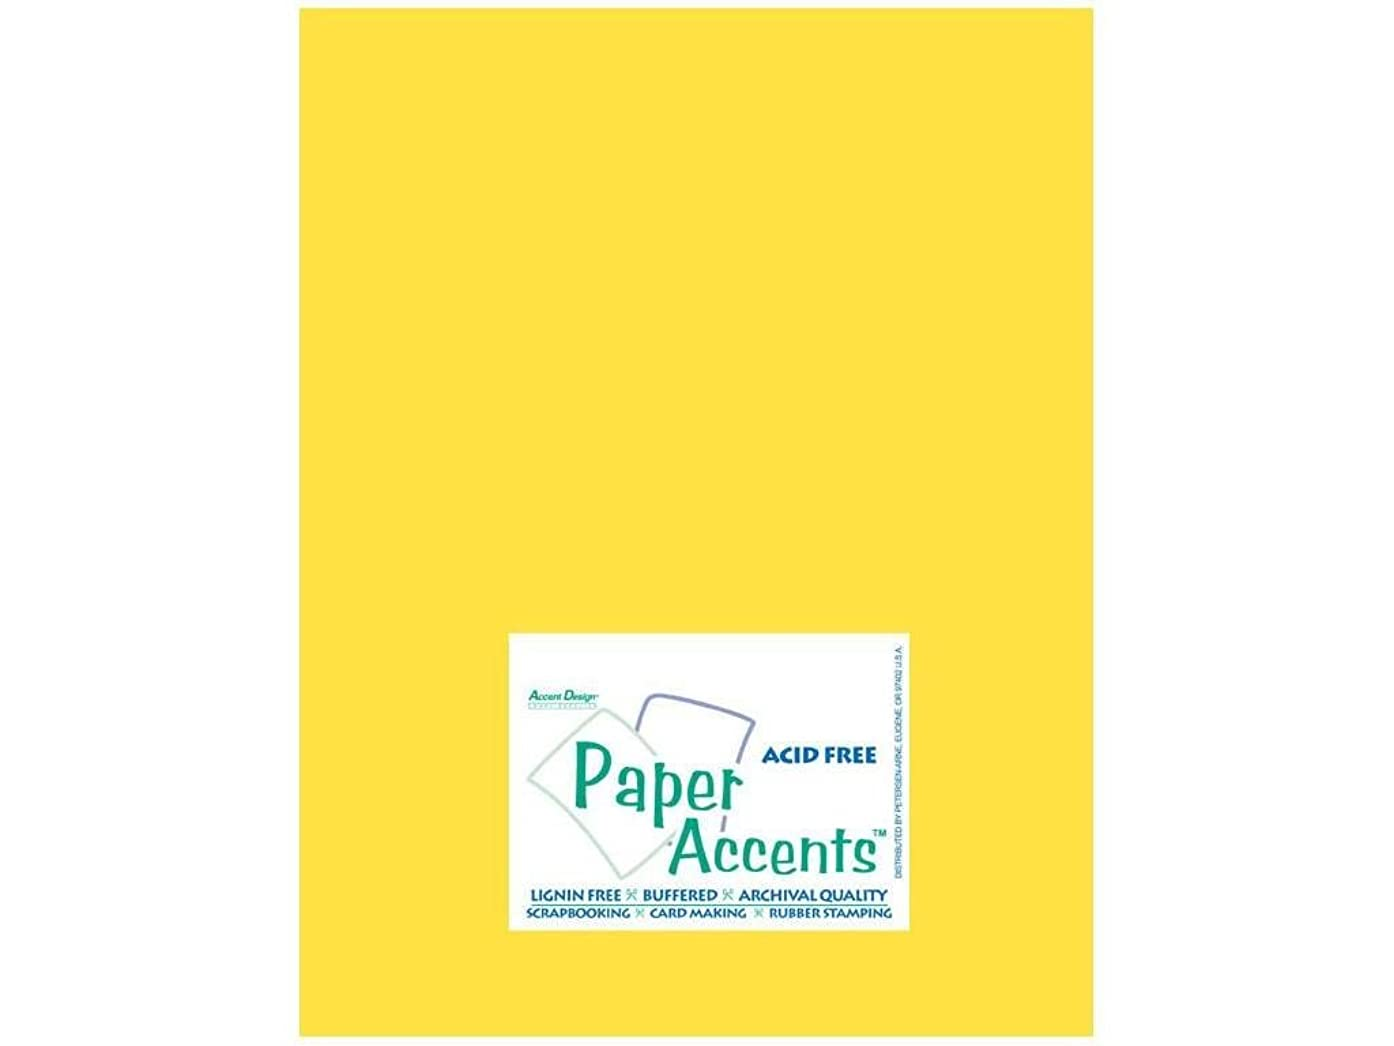 Accent Design Paper Accents ADPaperStash8.5x11Lemon Cdstk Stash Builder 8.5x11 65# Lemon